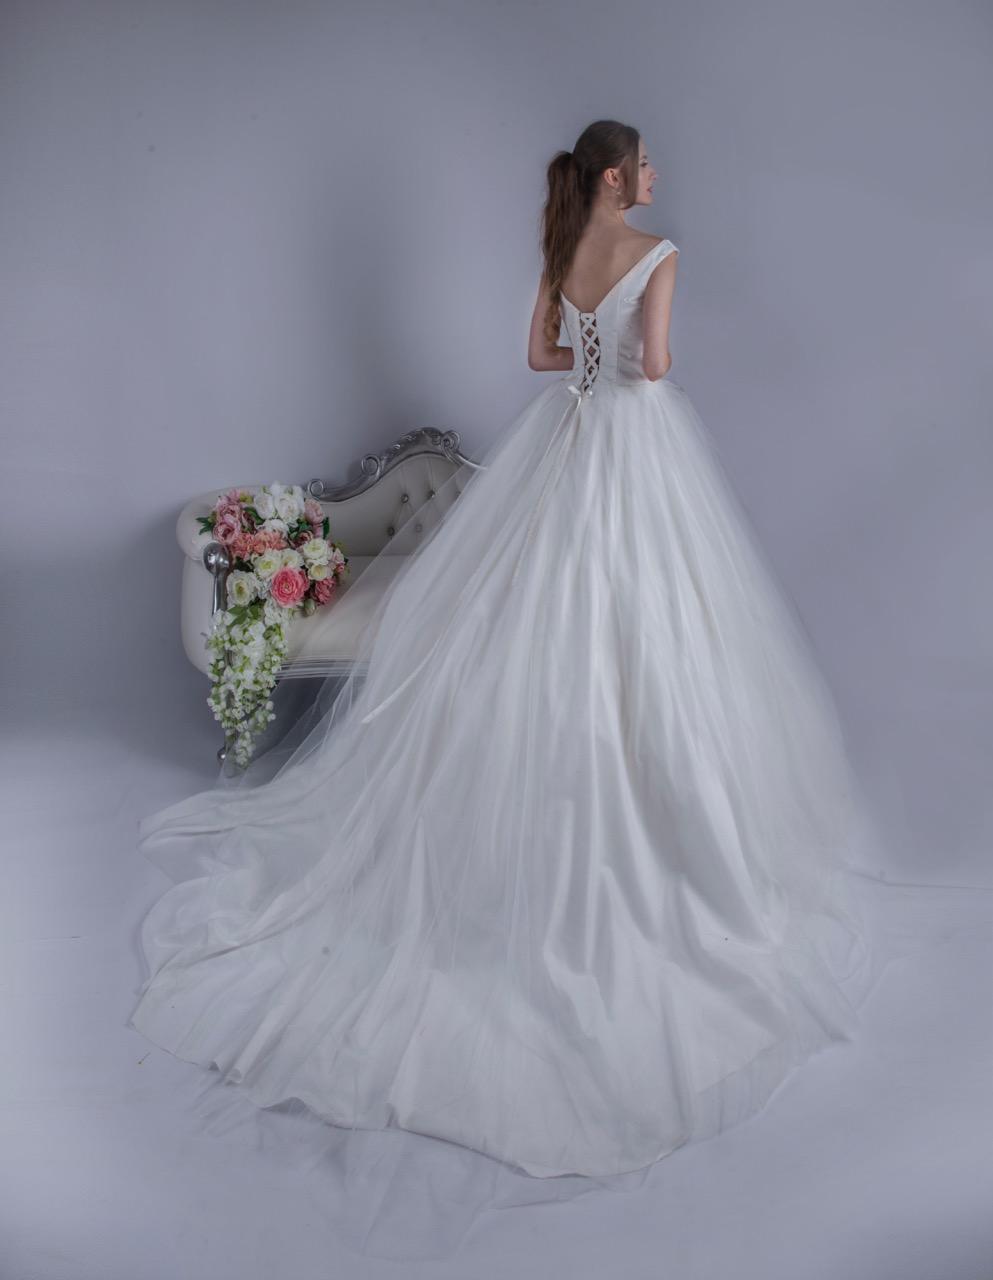 Robe de mariée en tulle avec un laçage nu au dos